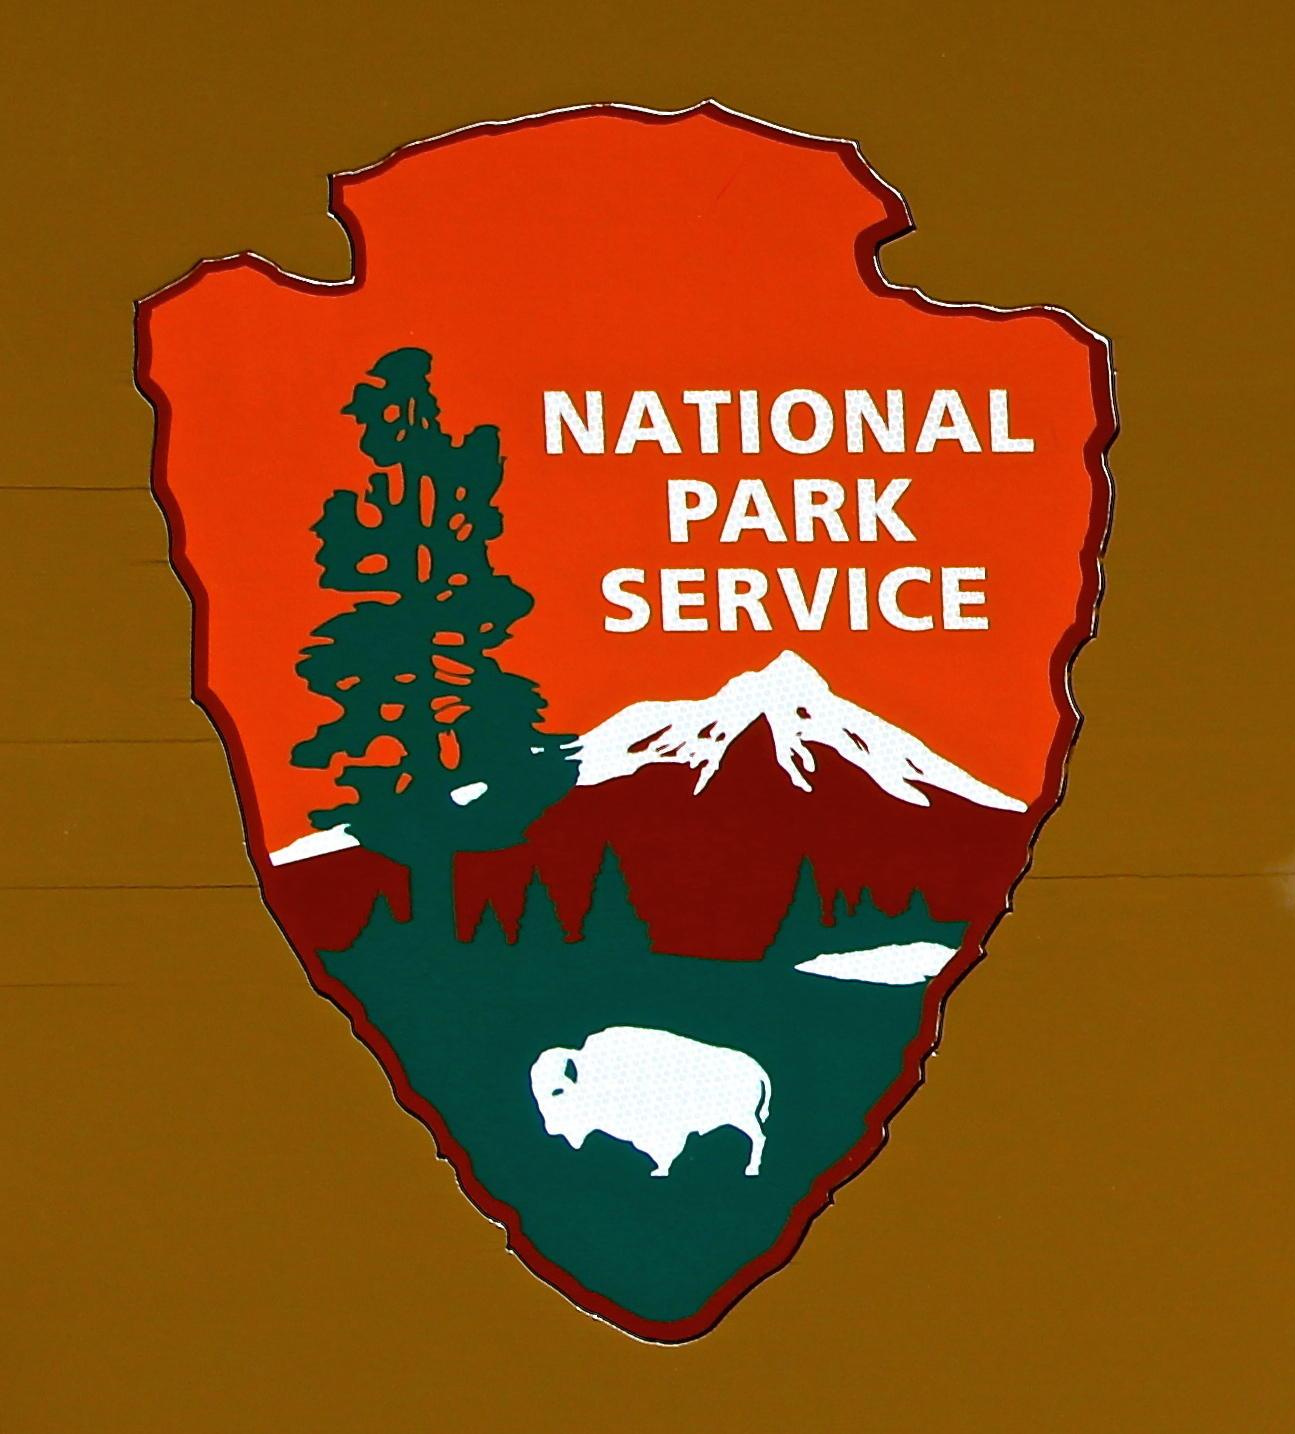 Find a Park (U.S. National Park Service)